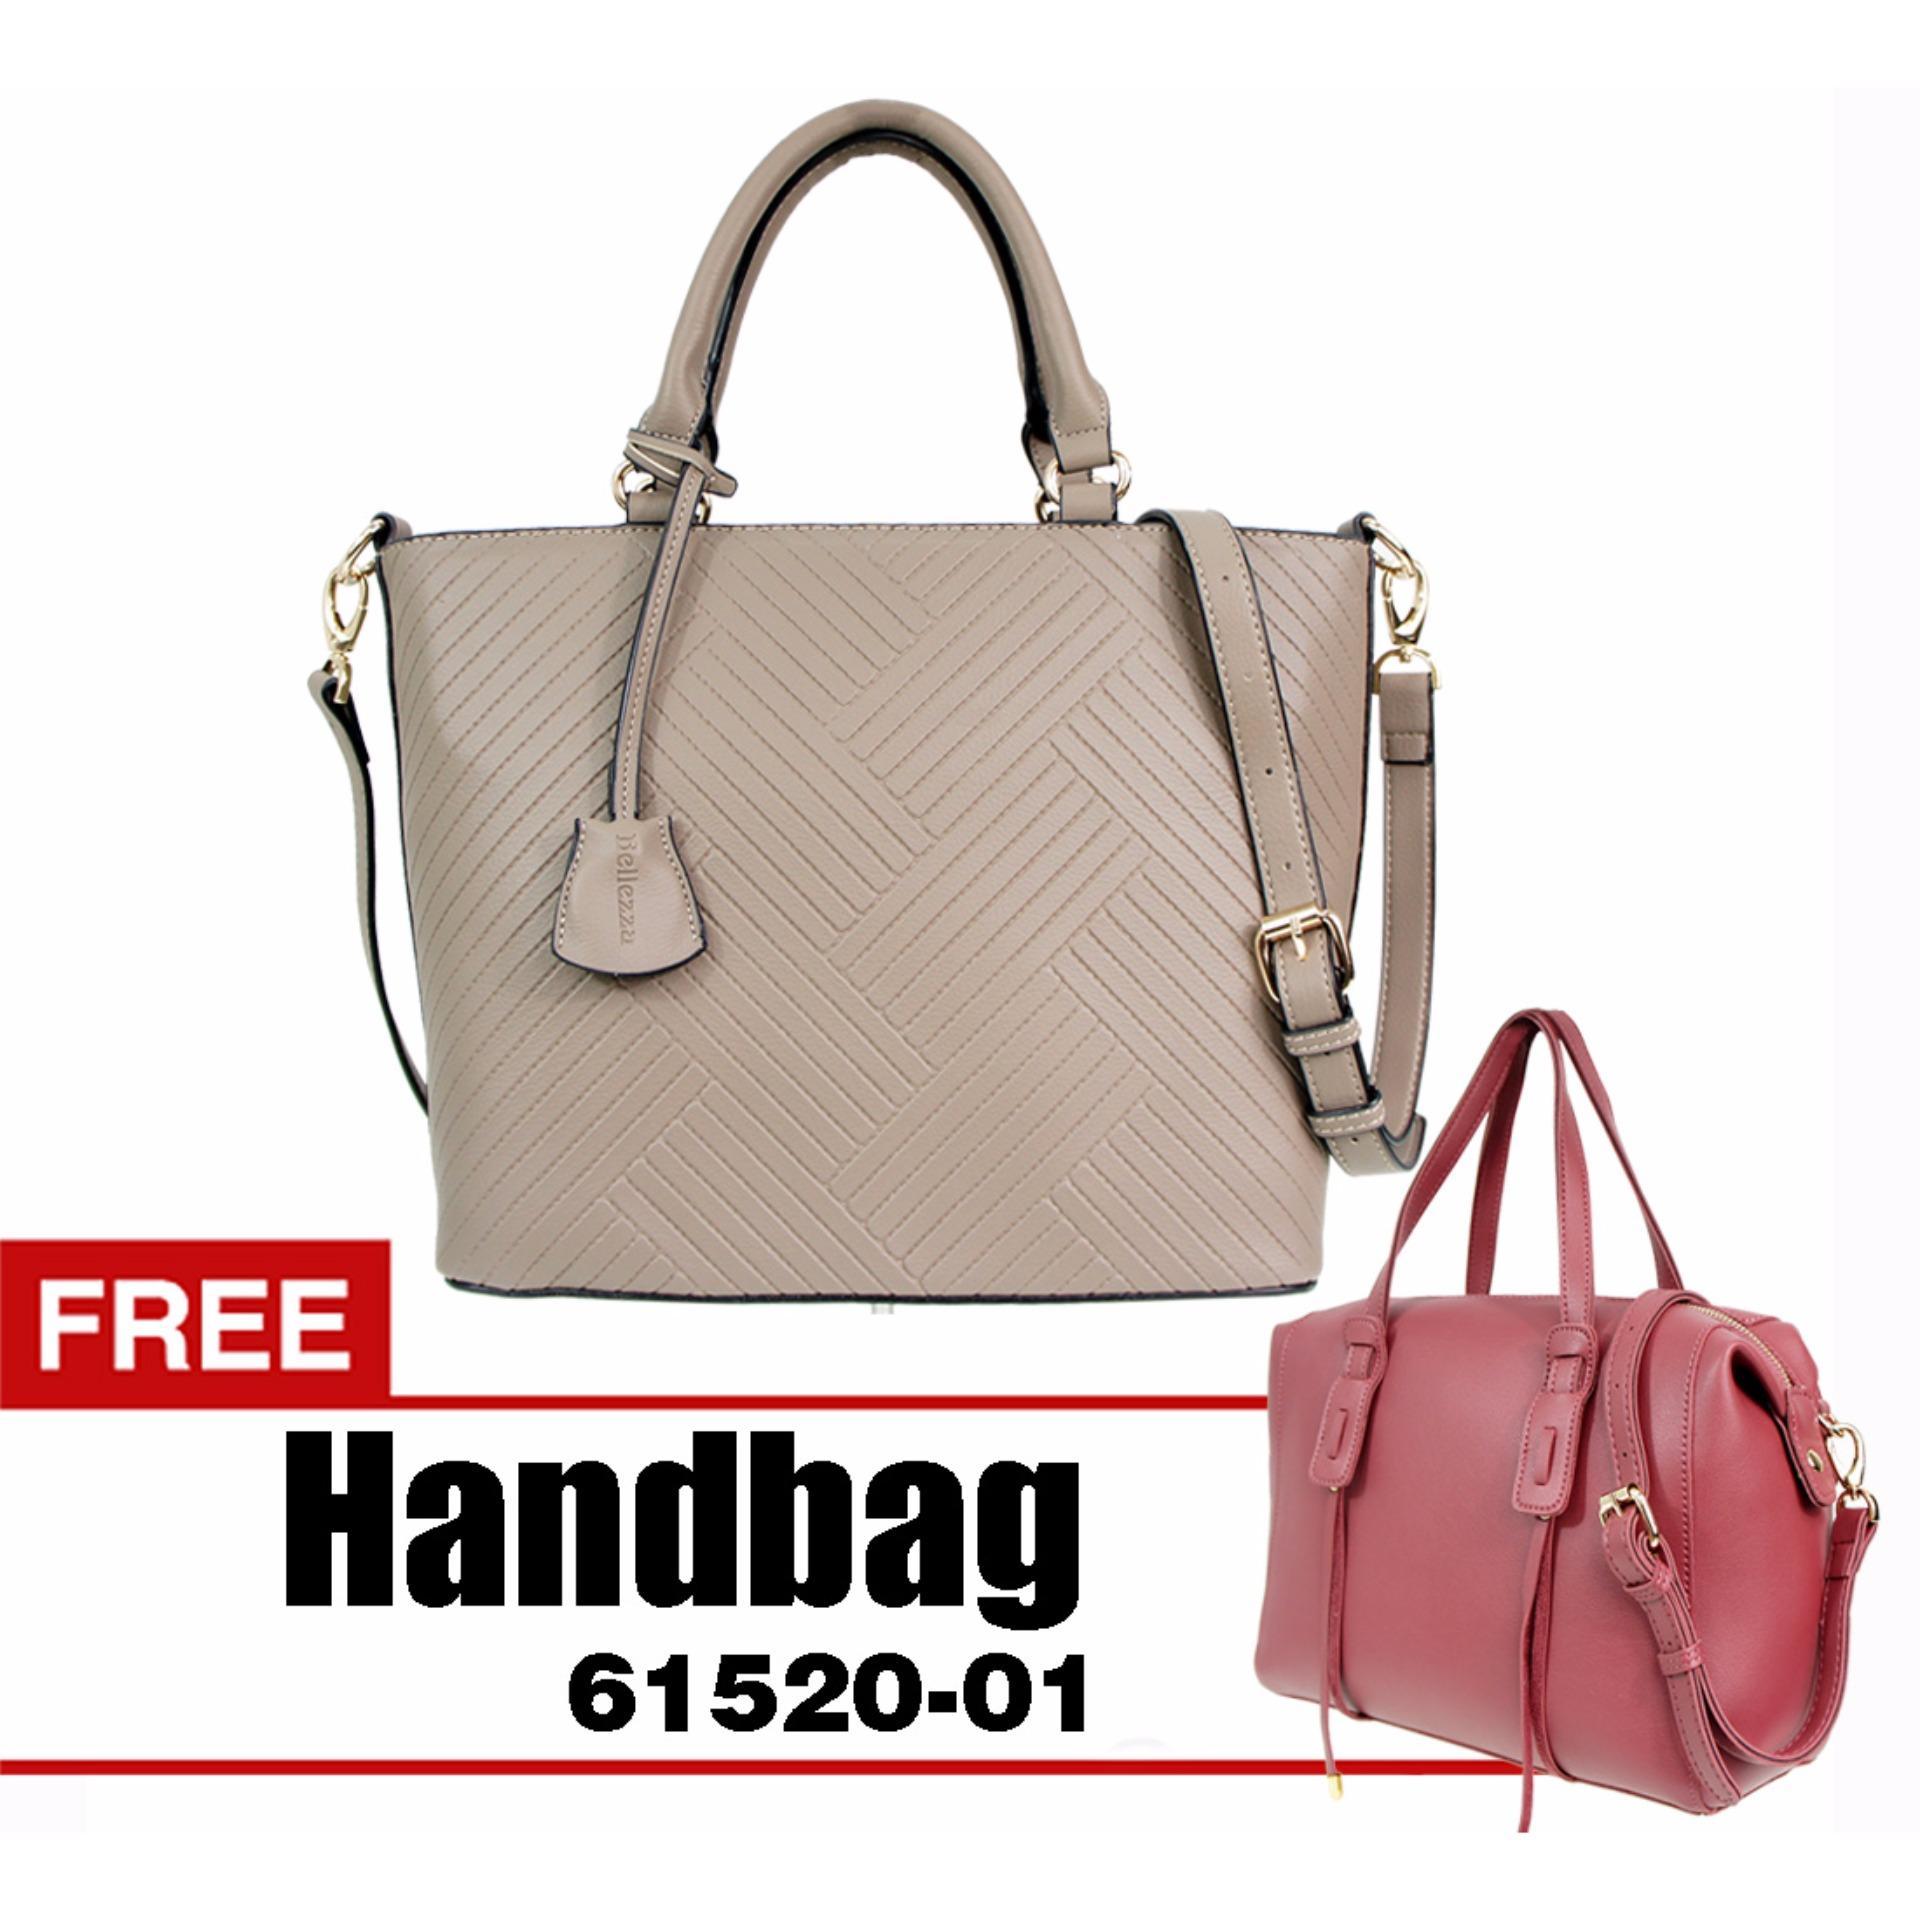 Bellezza 61509-01-Camel - Handbag - Tas Wanita - BUY 1 GET 1 FREE